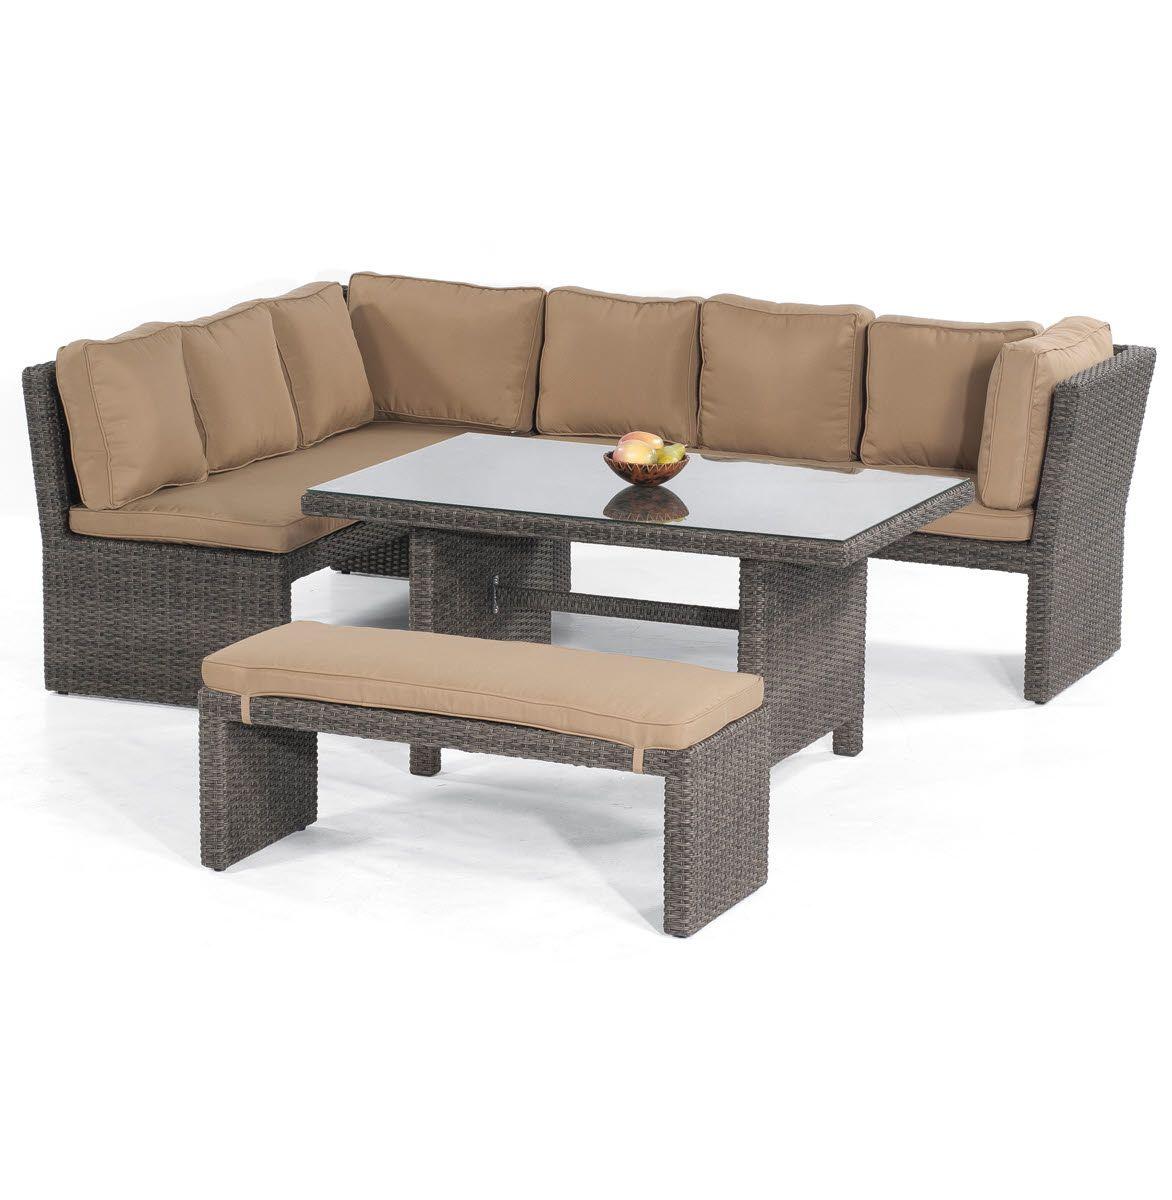 Full Size of Kalibo Sitzgruppe 6 Teilig Geflecht 20 Dining Lounge Mbel Luxus Küche Garten Wohnzimmer Outliv. Kalibo Sitzgruppe 6 Teilig Geflecht